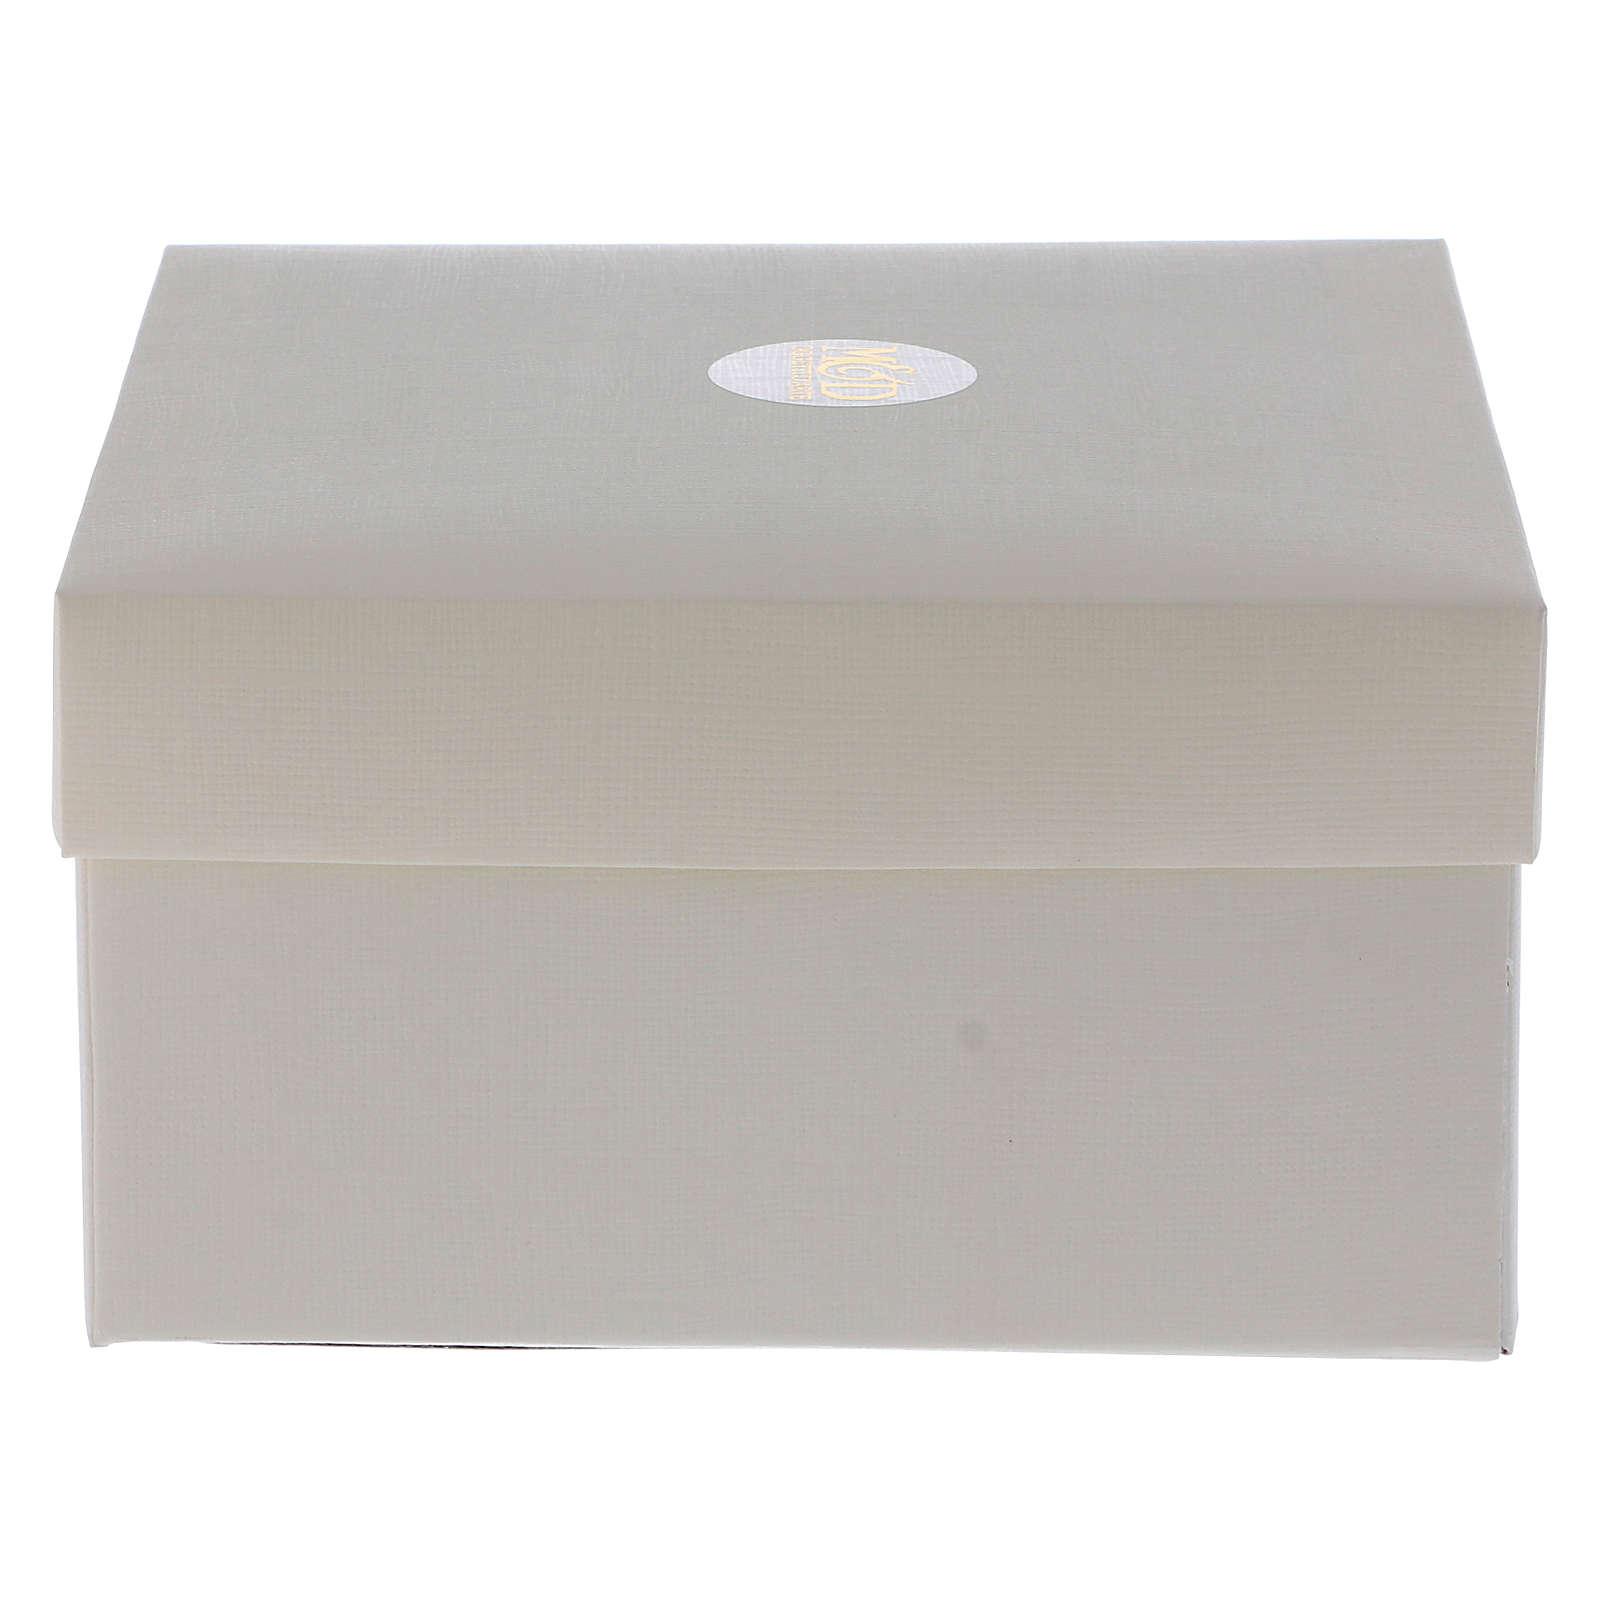 Bombonera Comunión Cruz con lámina plata 10x5 cm 3